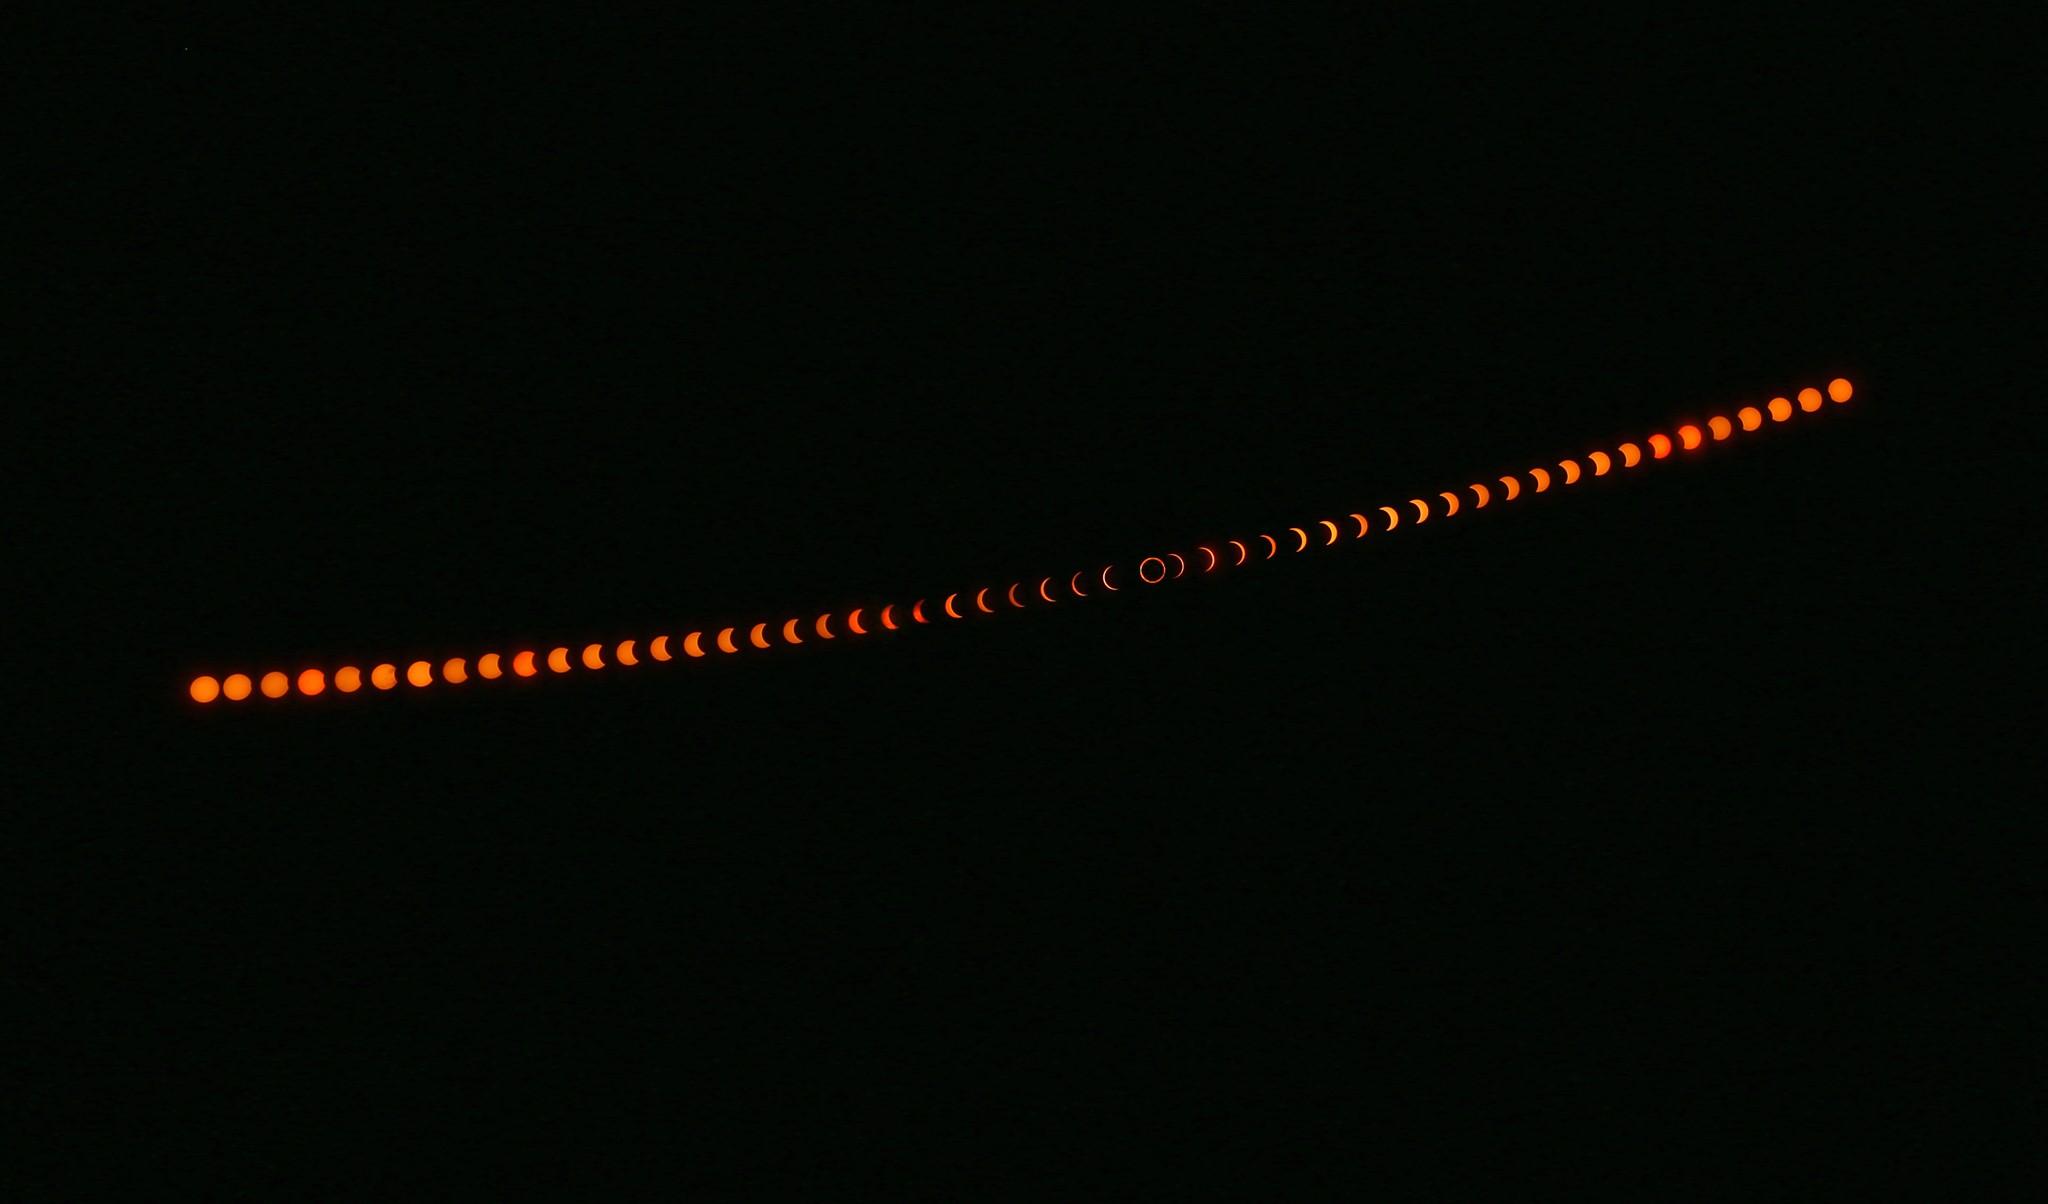 2020e697a5e792b0e89d95-annular-solar-eclipsee980a3e7ba8ce5a4aae999bd